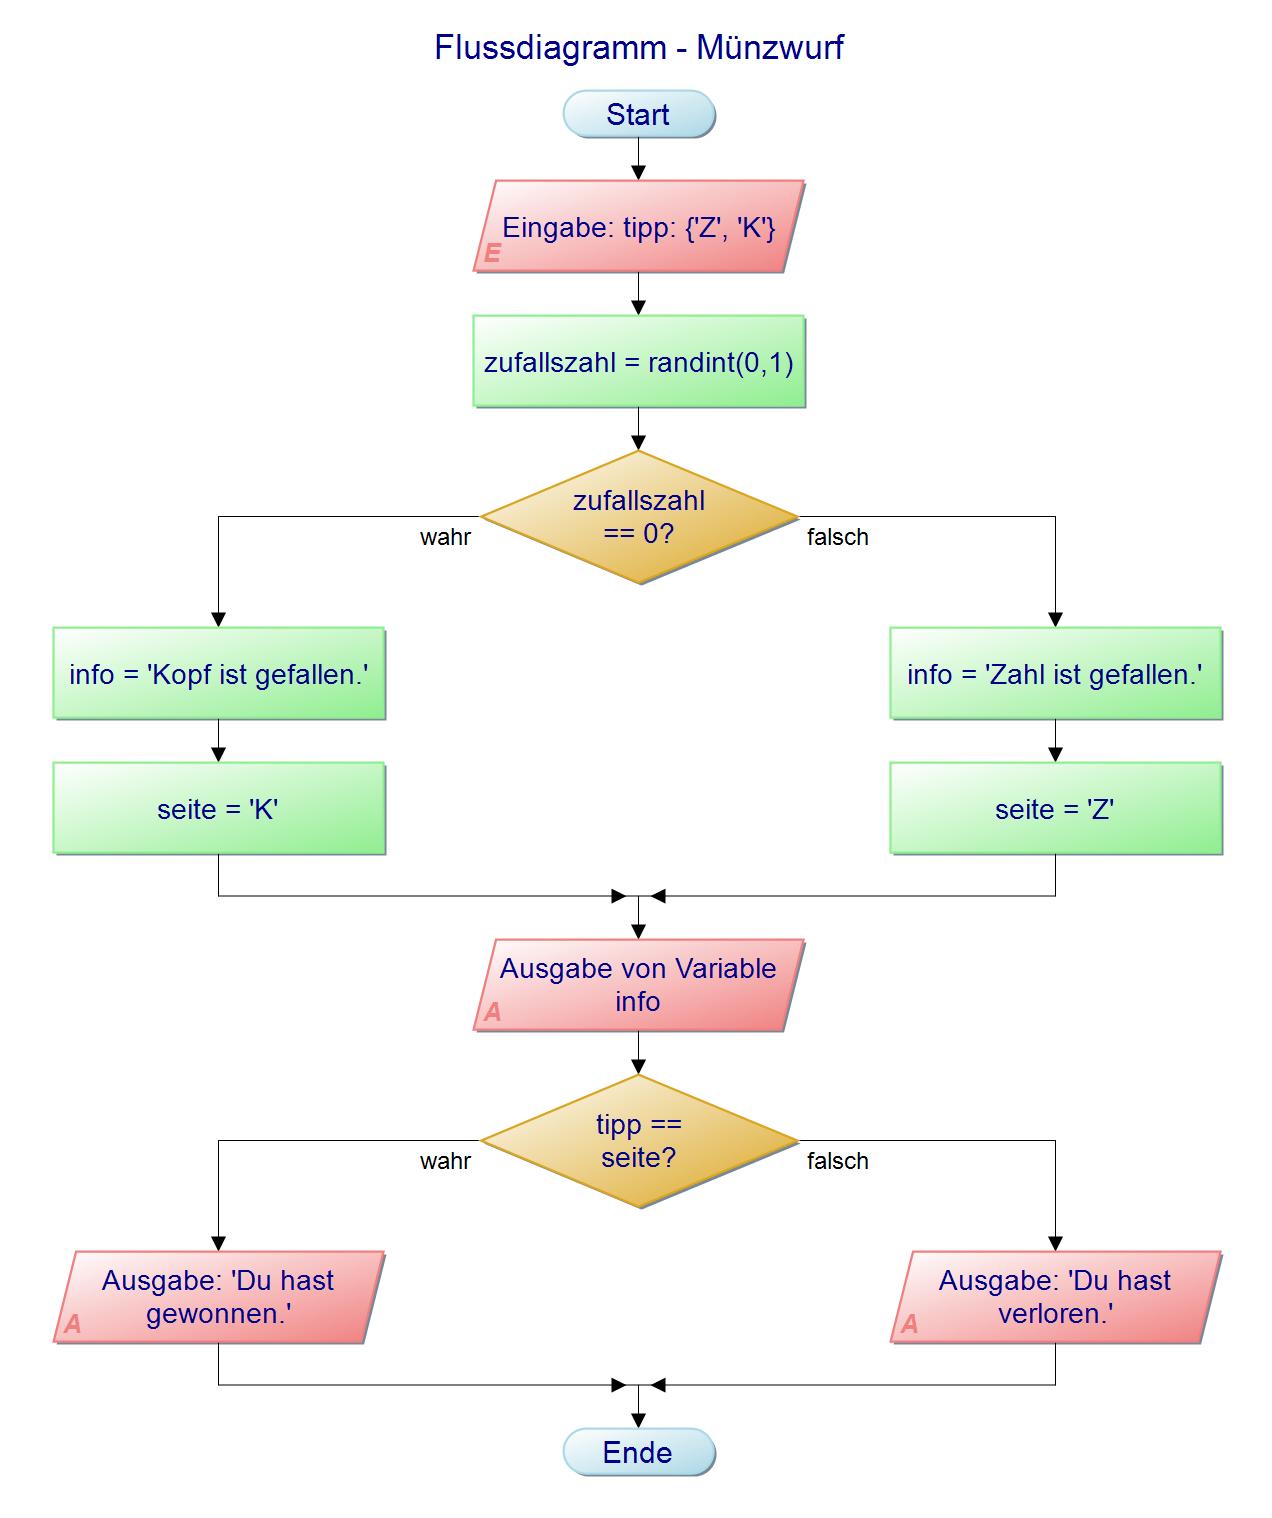 Flussdiagramm - Münzwurf